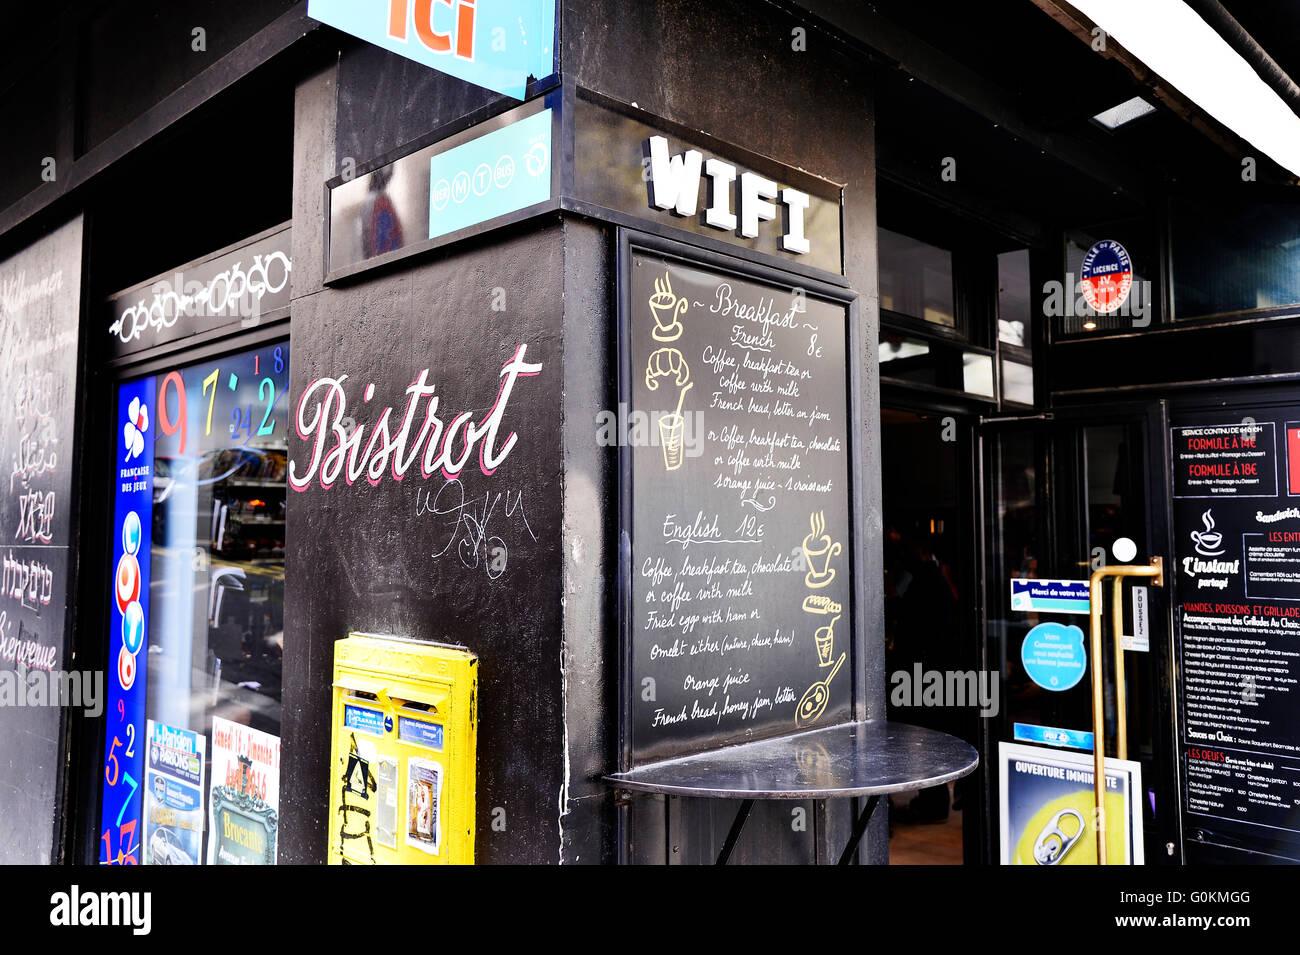 Bistrot in Paris - Stock Image